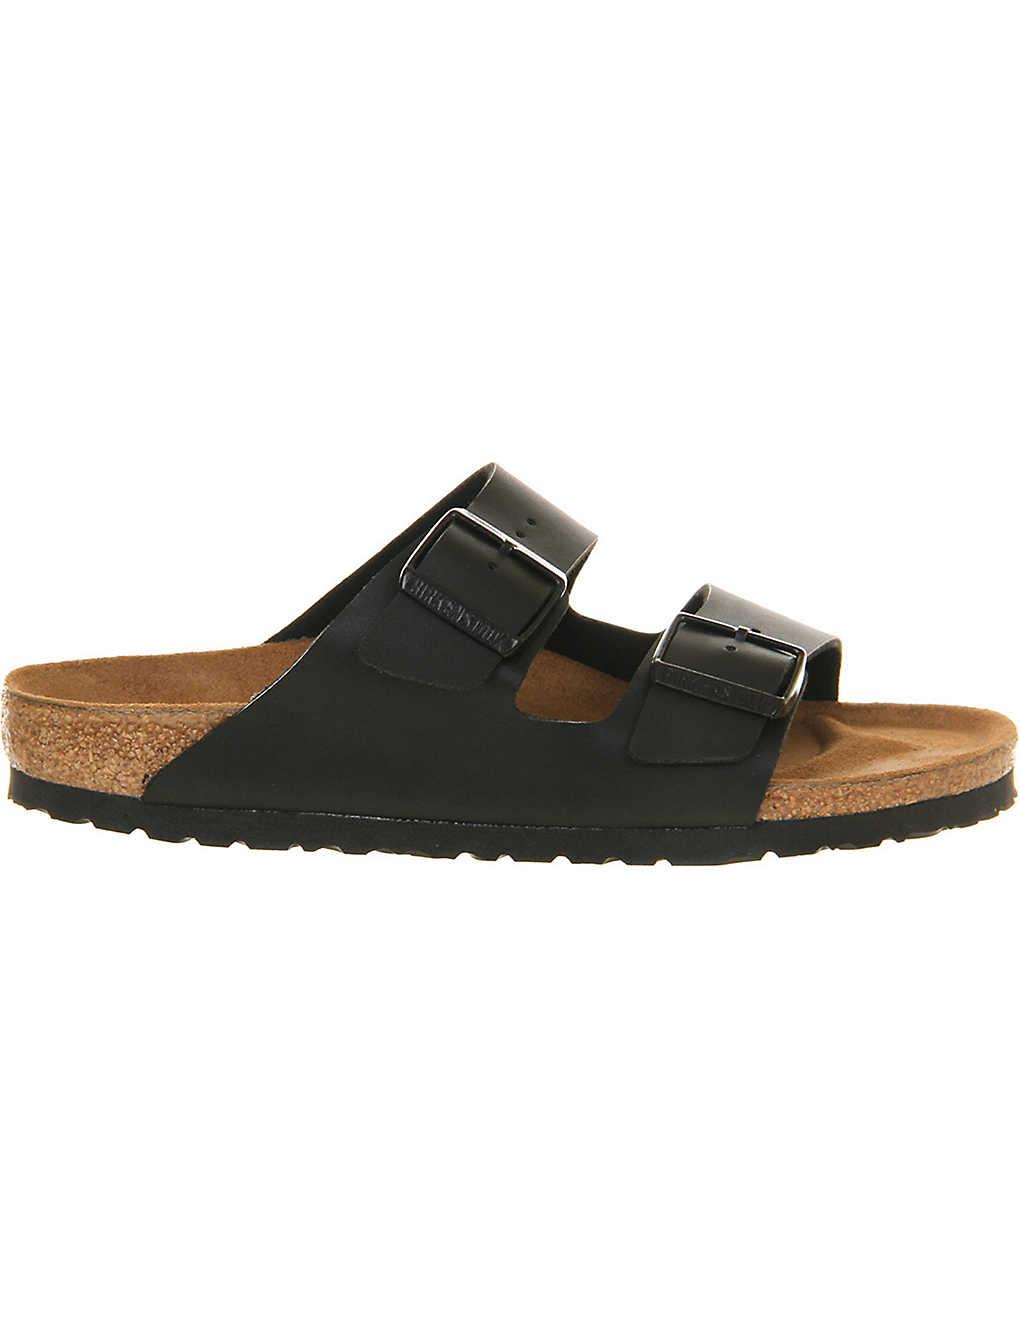 413f3fcbf9 BIRKENSTOCK - Arizona Birko-Flor sandals | Selfridges.com